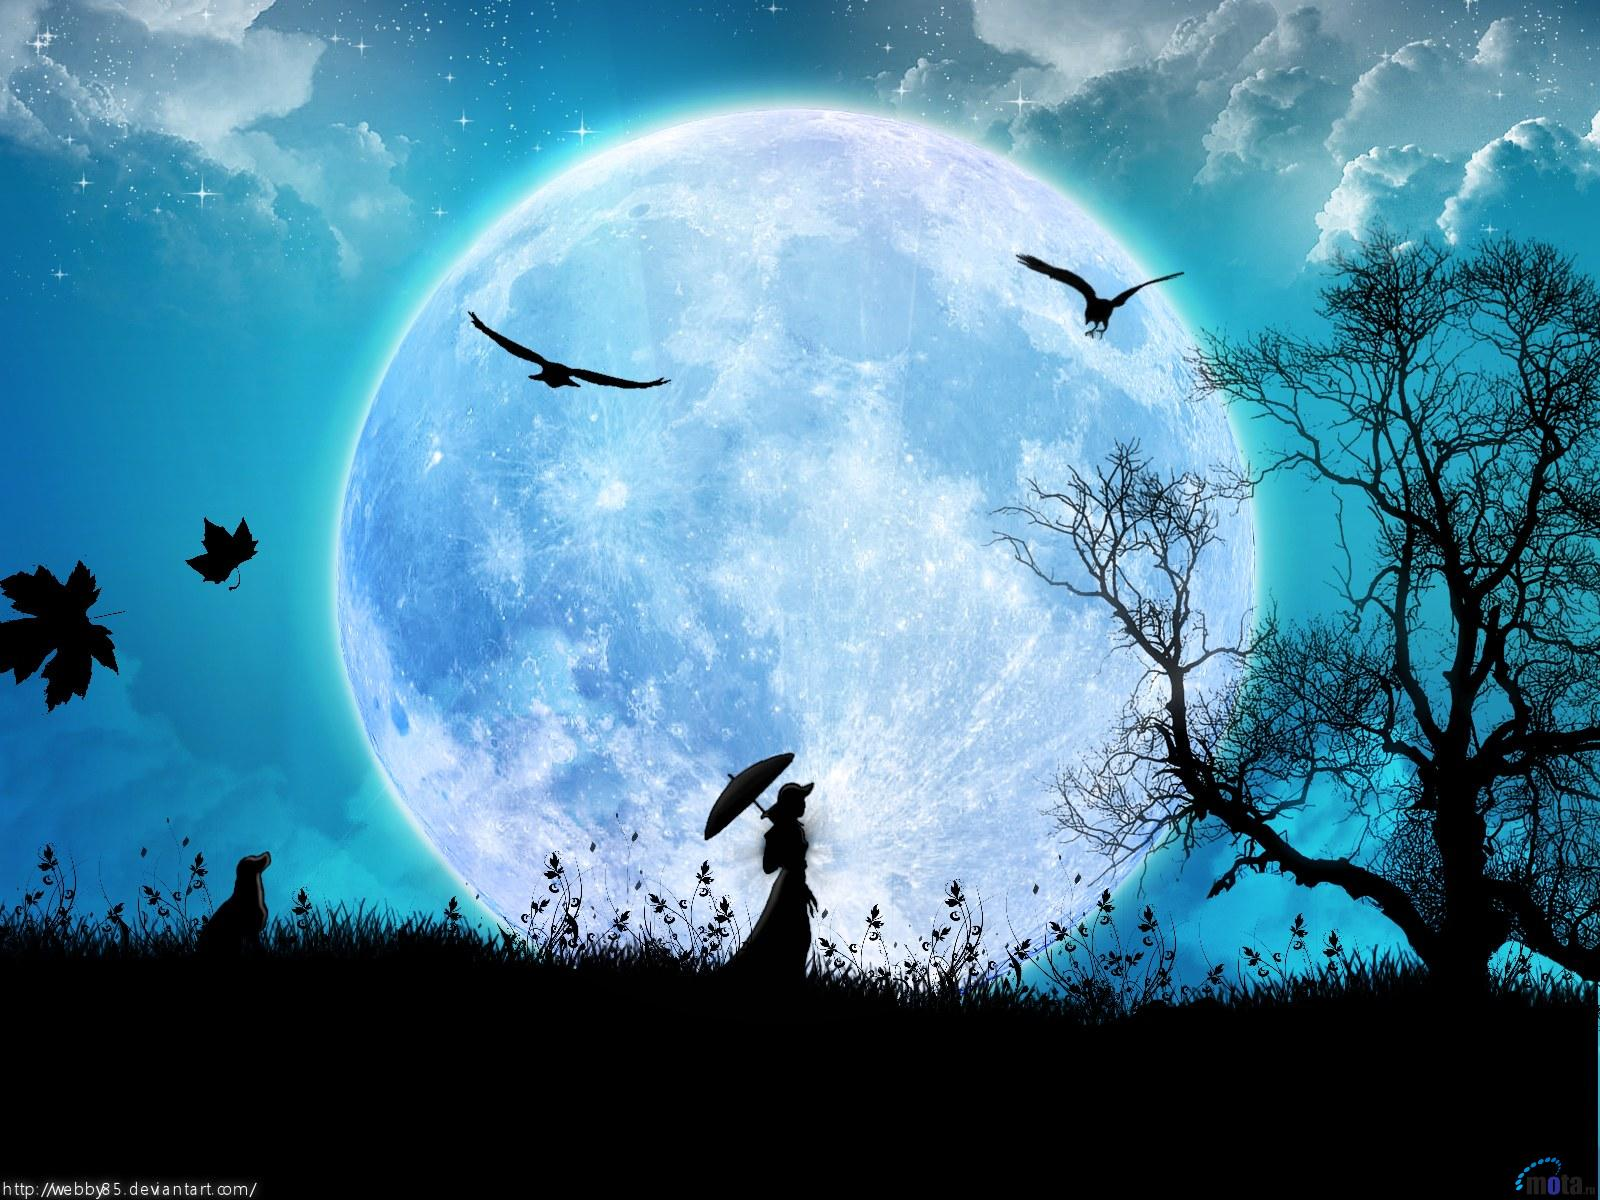 Beautiful Night Sky wallpaperWallpaper Background Wallpaper Background 1600x1200